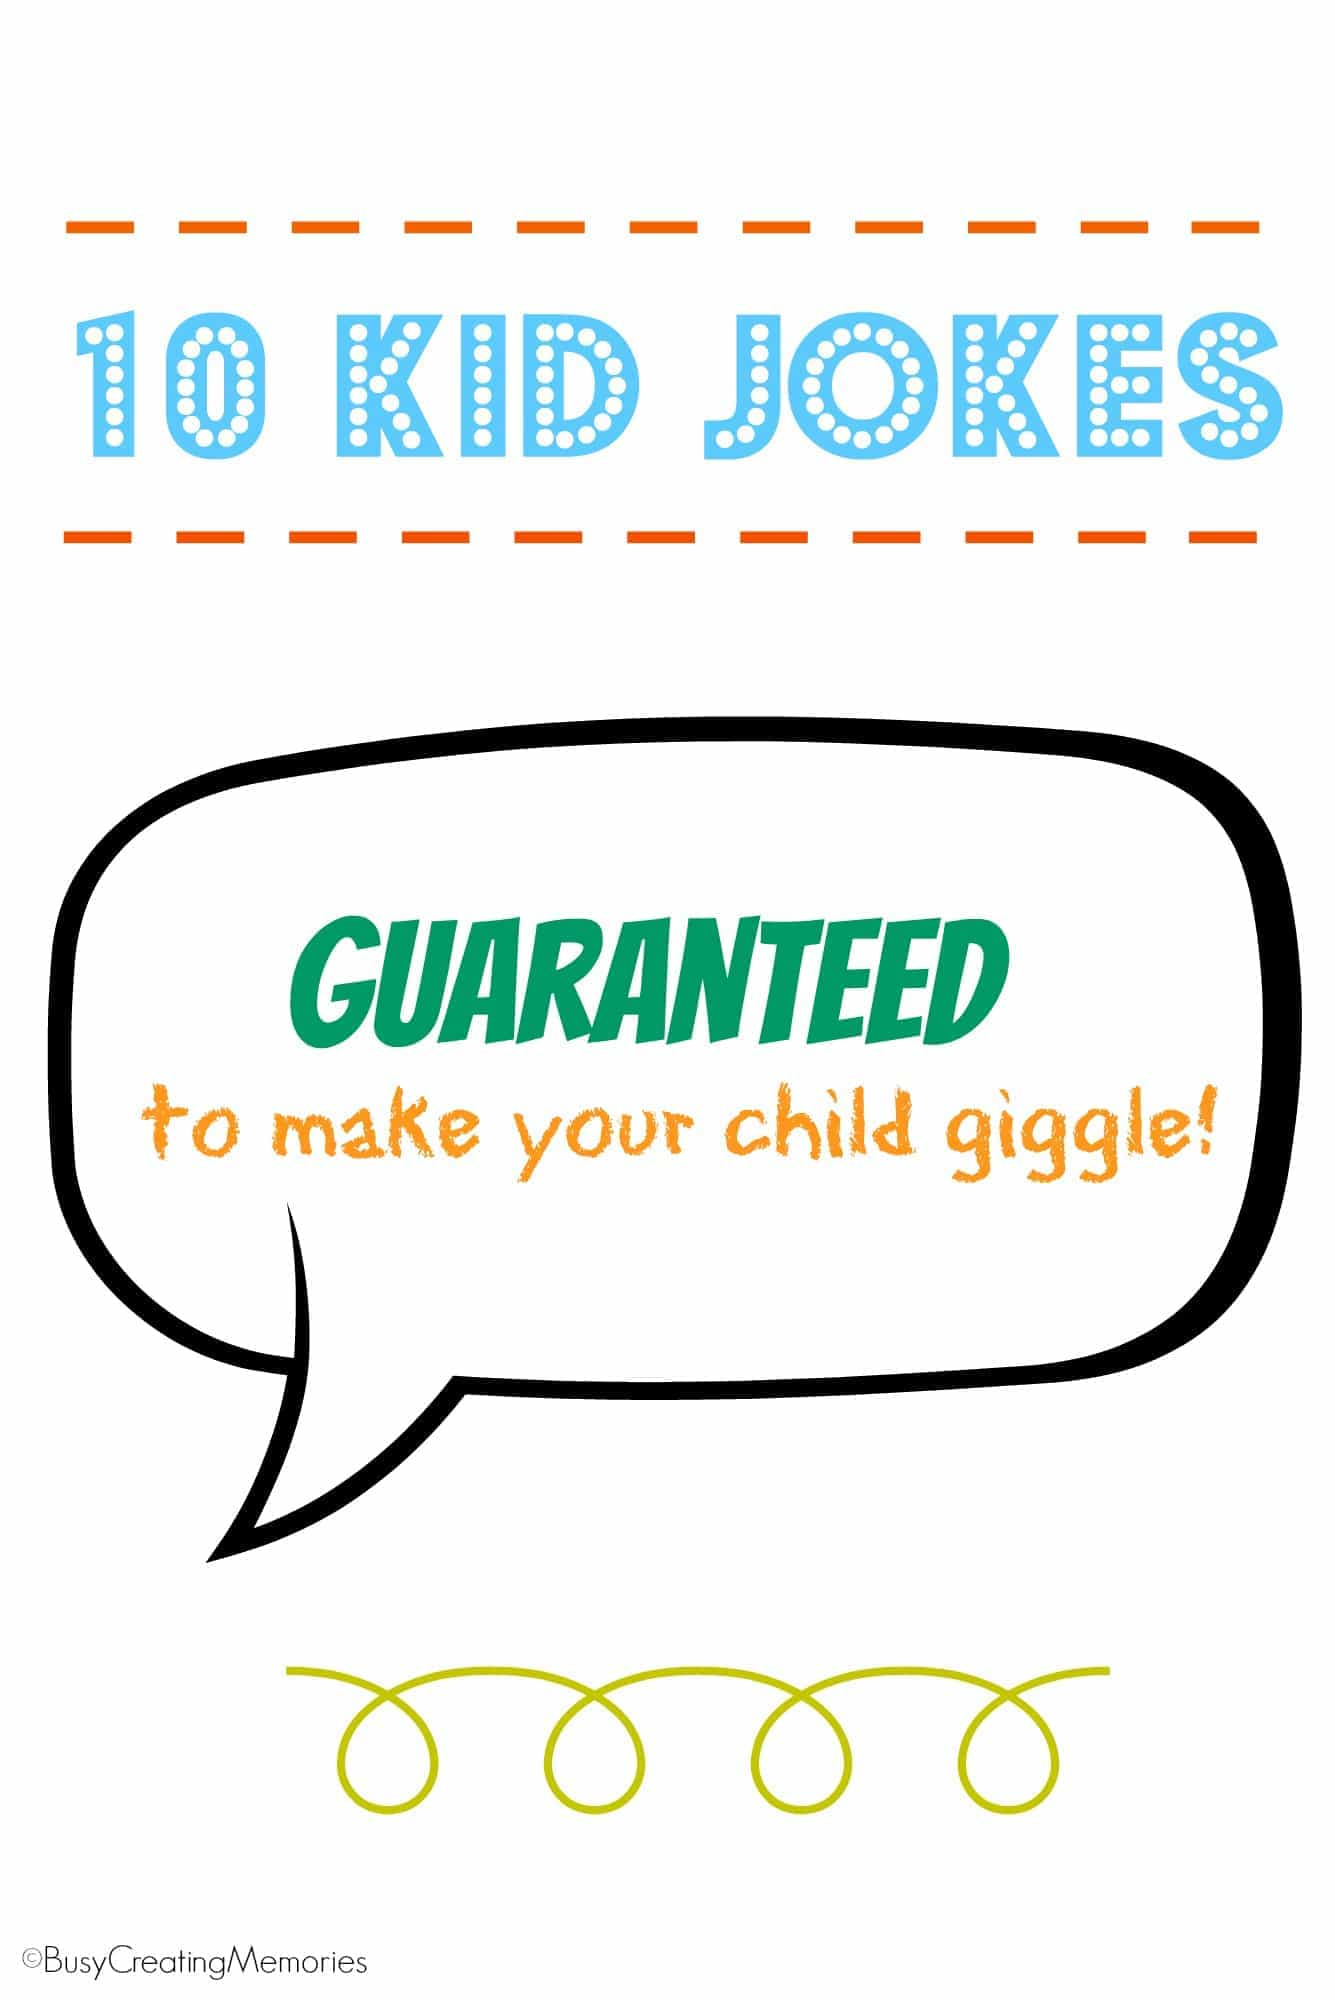 10 kid jokes guaranteed to make your child giggle!